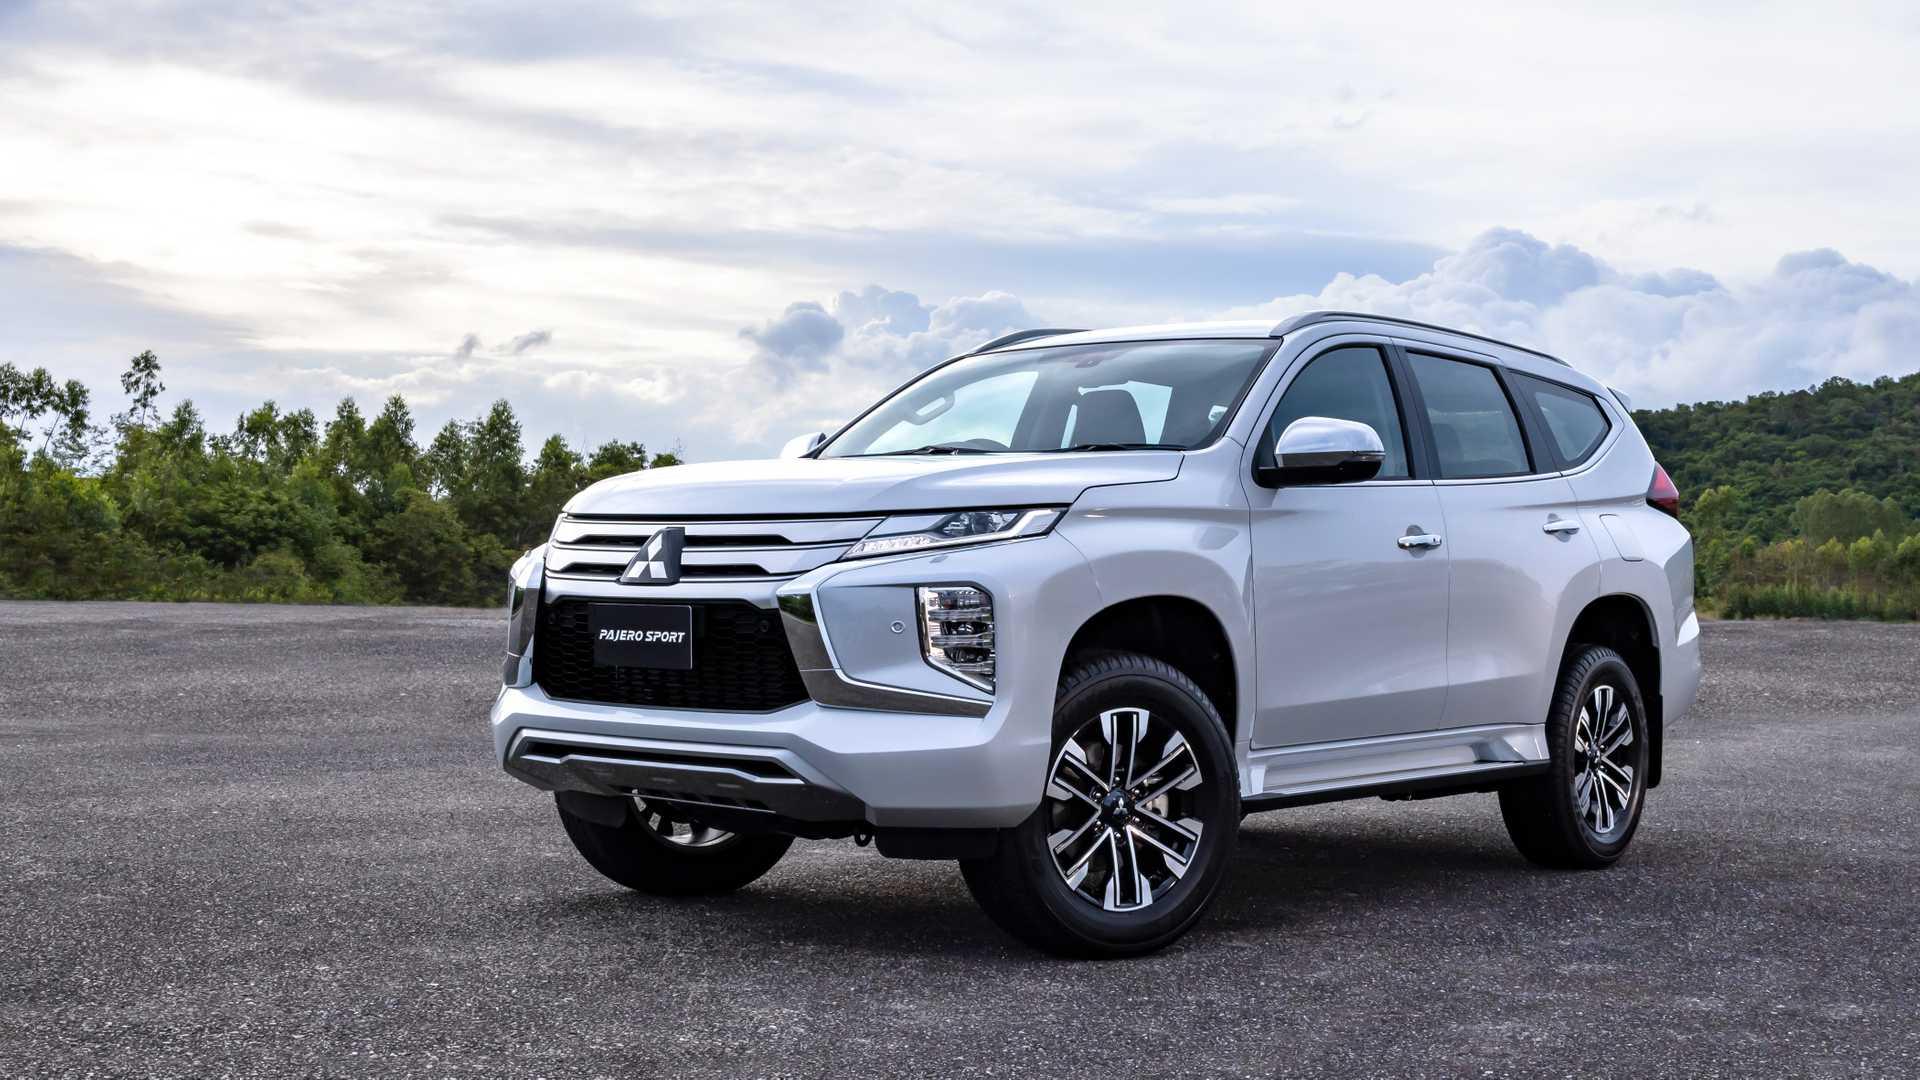 2020_Mitsubishi_Pajero_Sport_facelift_0000